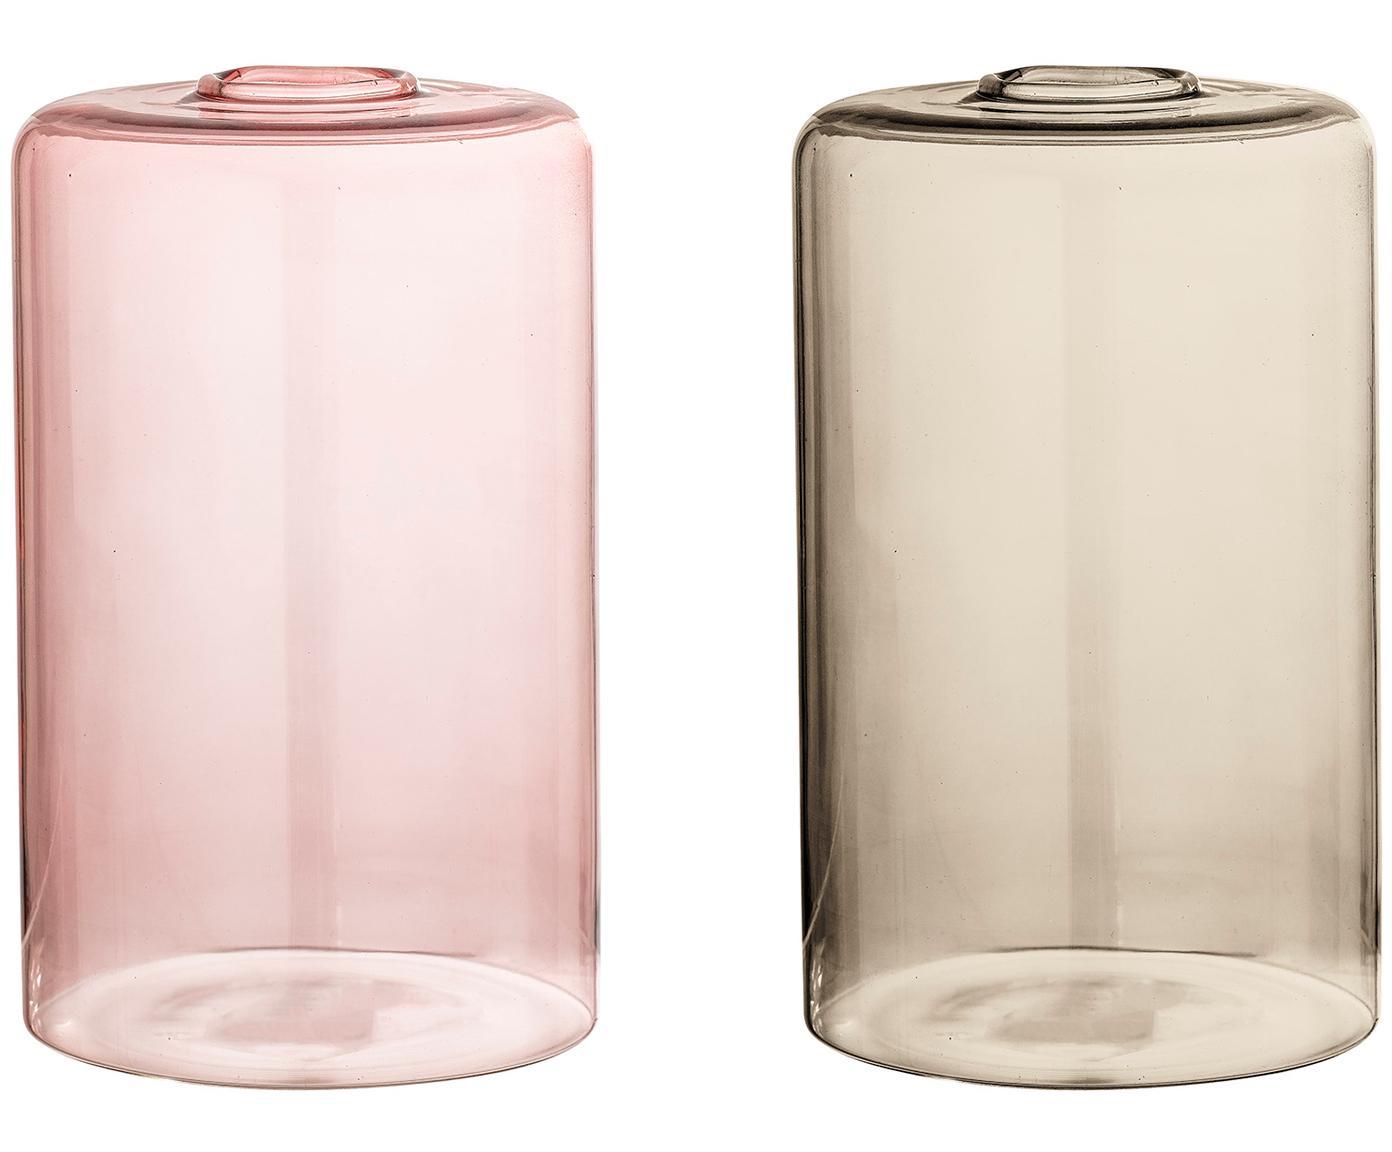 Vasen-Set Uwe aus Glas, 2-tlg, Glas, Rosa, Hellbraun, Ø 10 x H 16 cm